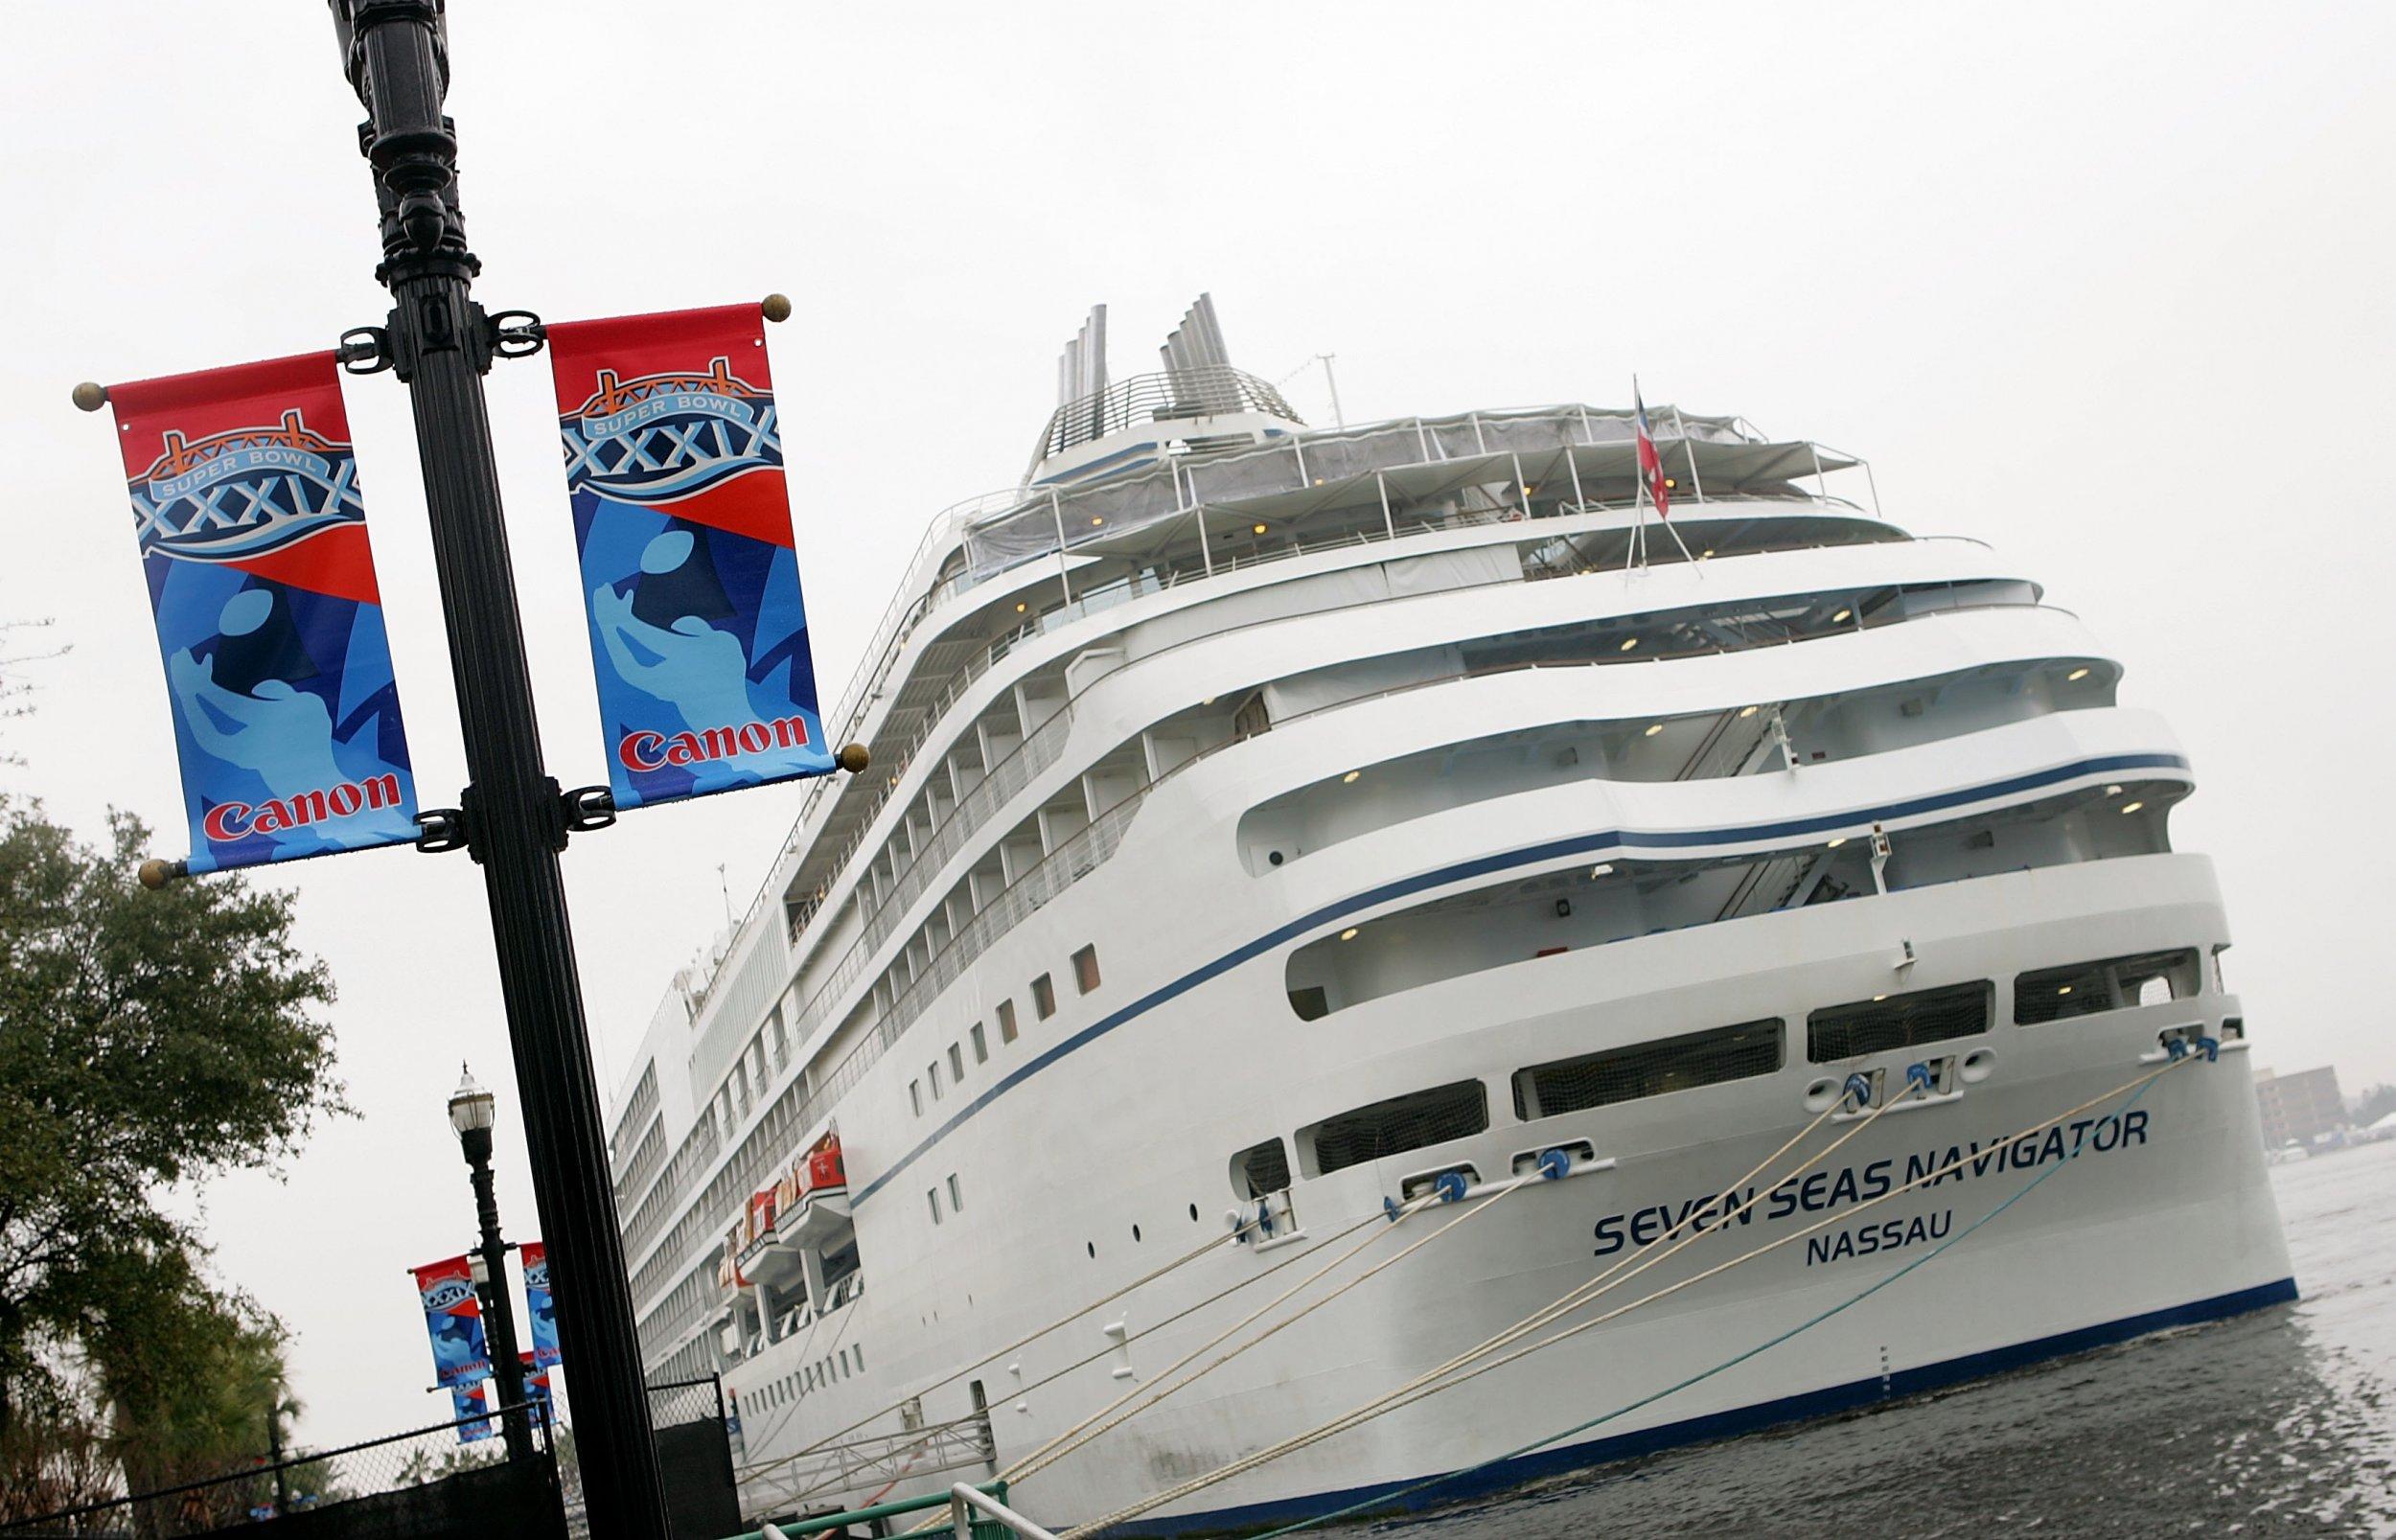 cruise ship passenger evacuation seven seas navigator